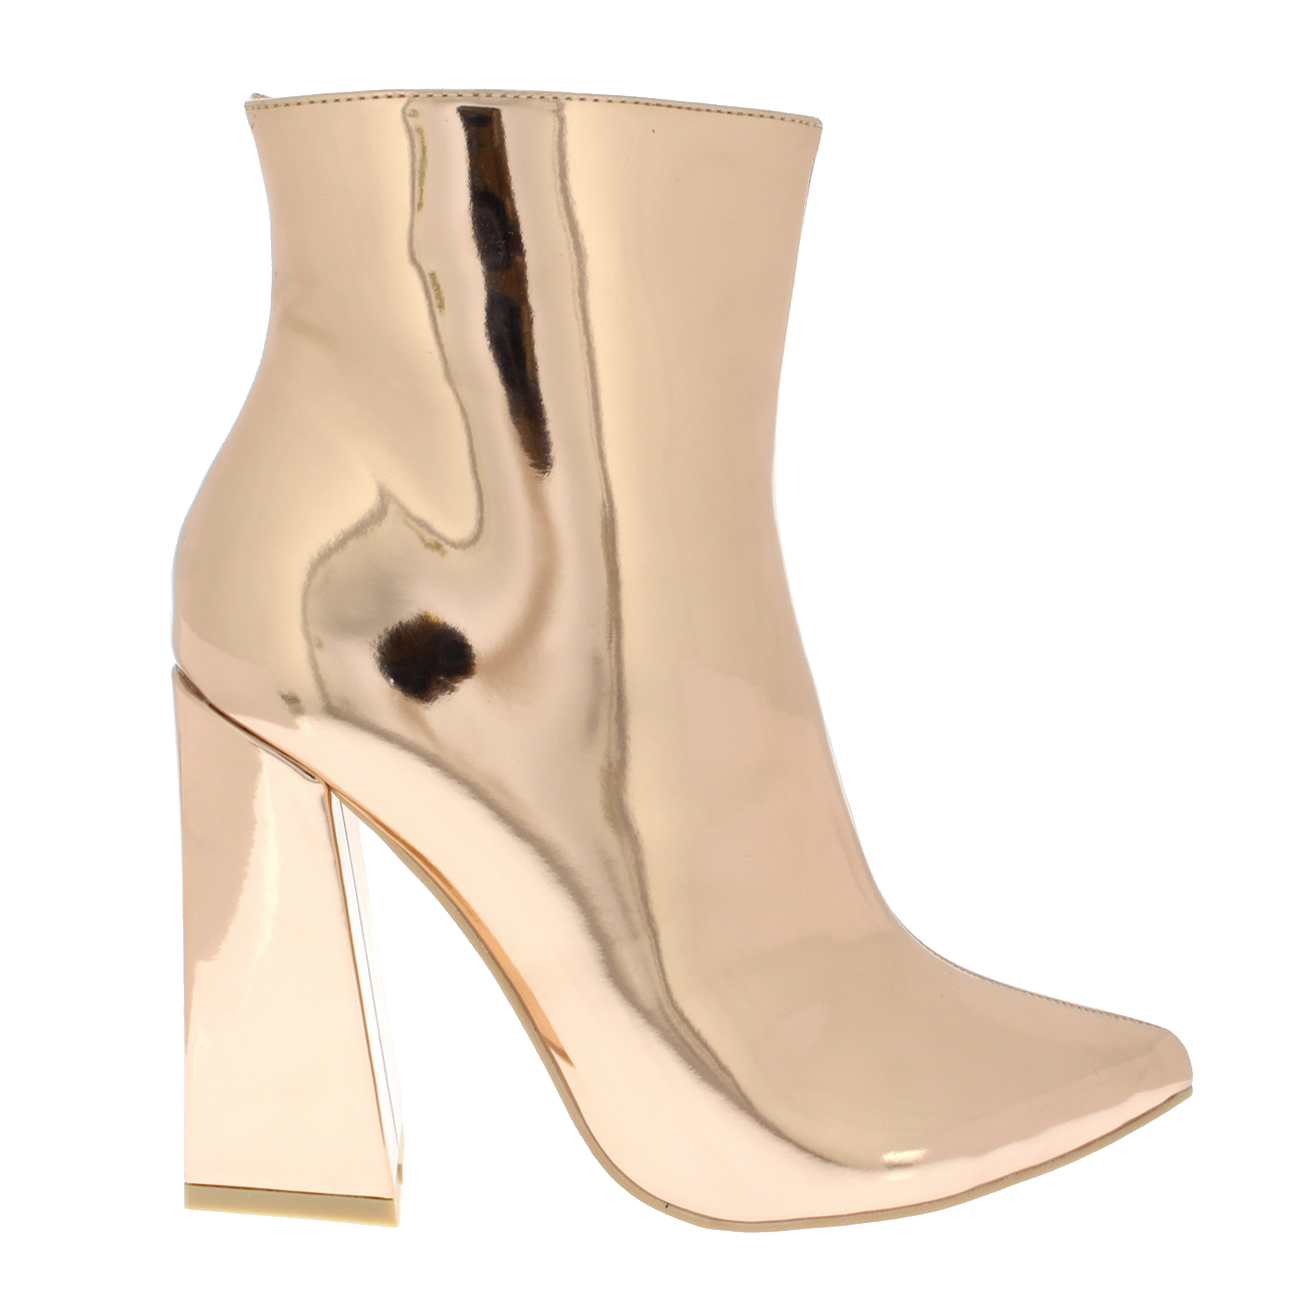 5d9e9d9c5f5 Womens Shiny Block Heel Fashion Chic Elegant Sassy Mid Heel Ankle ...